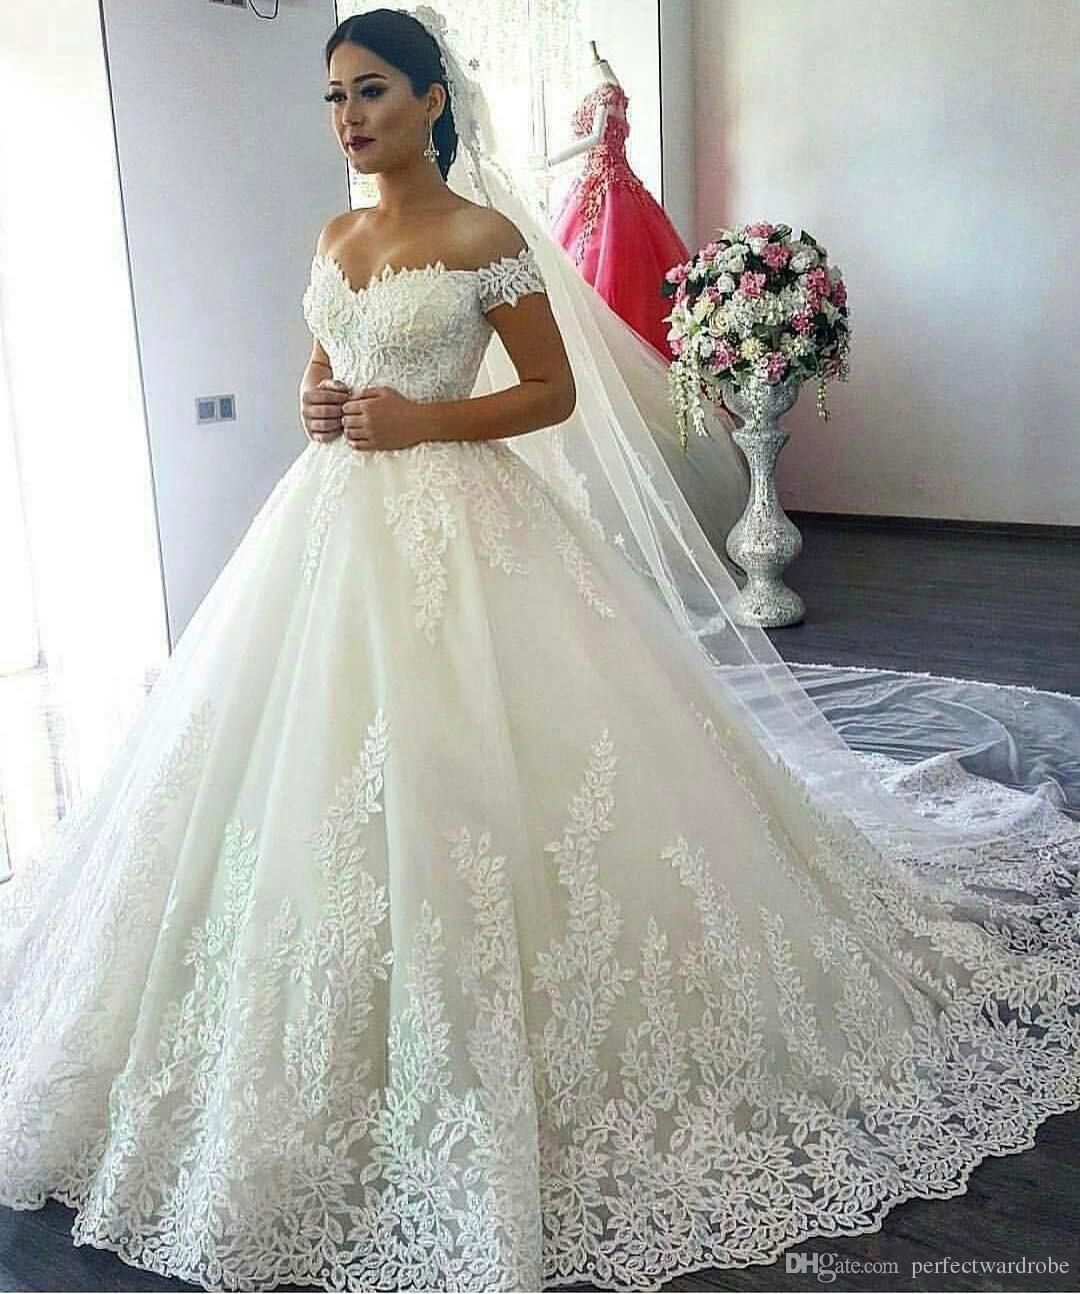 Discount Beautiful Arabic Wedding Dresses 2017 Designers Off ...